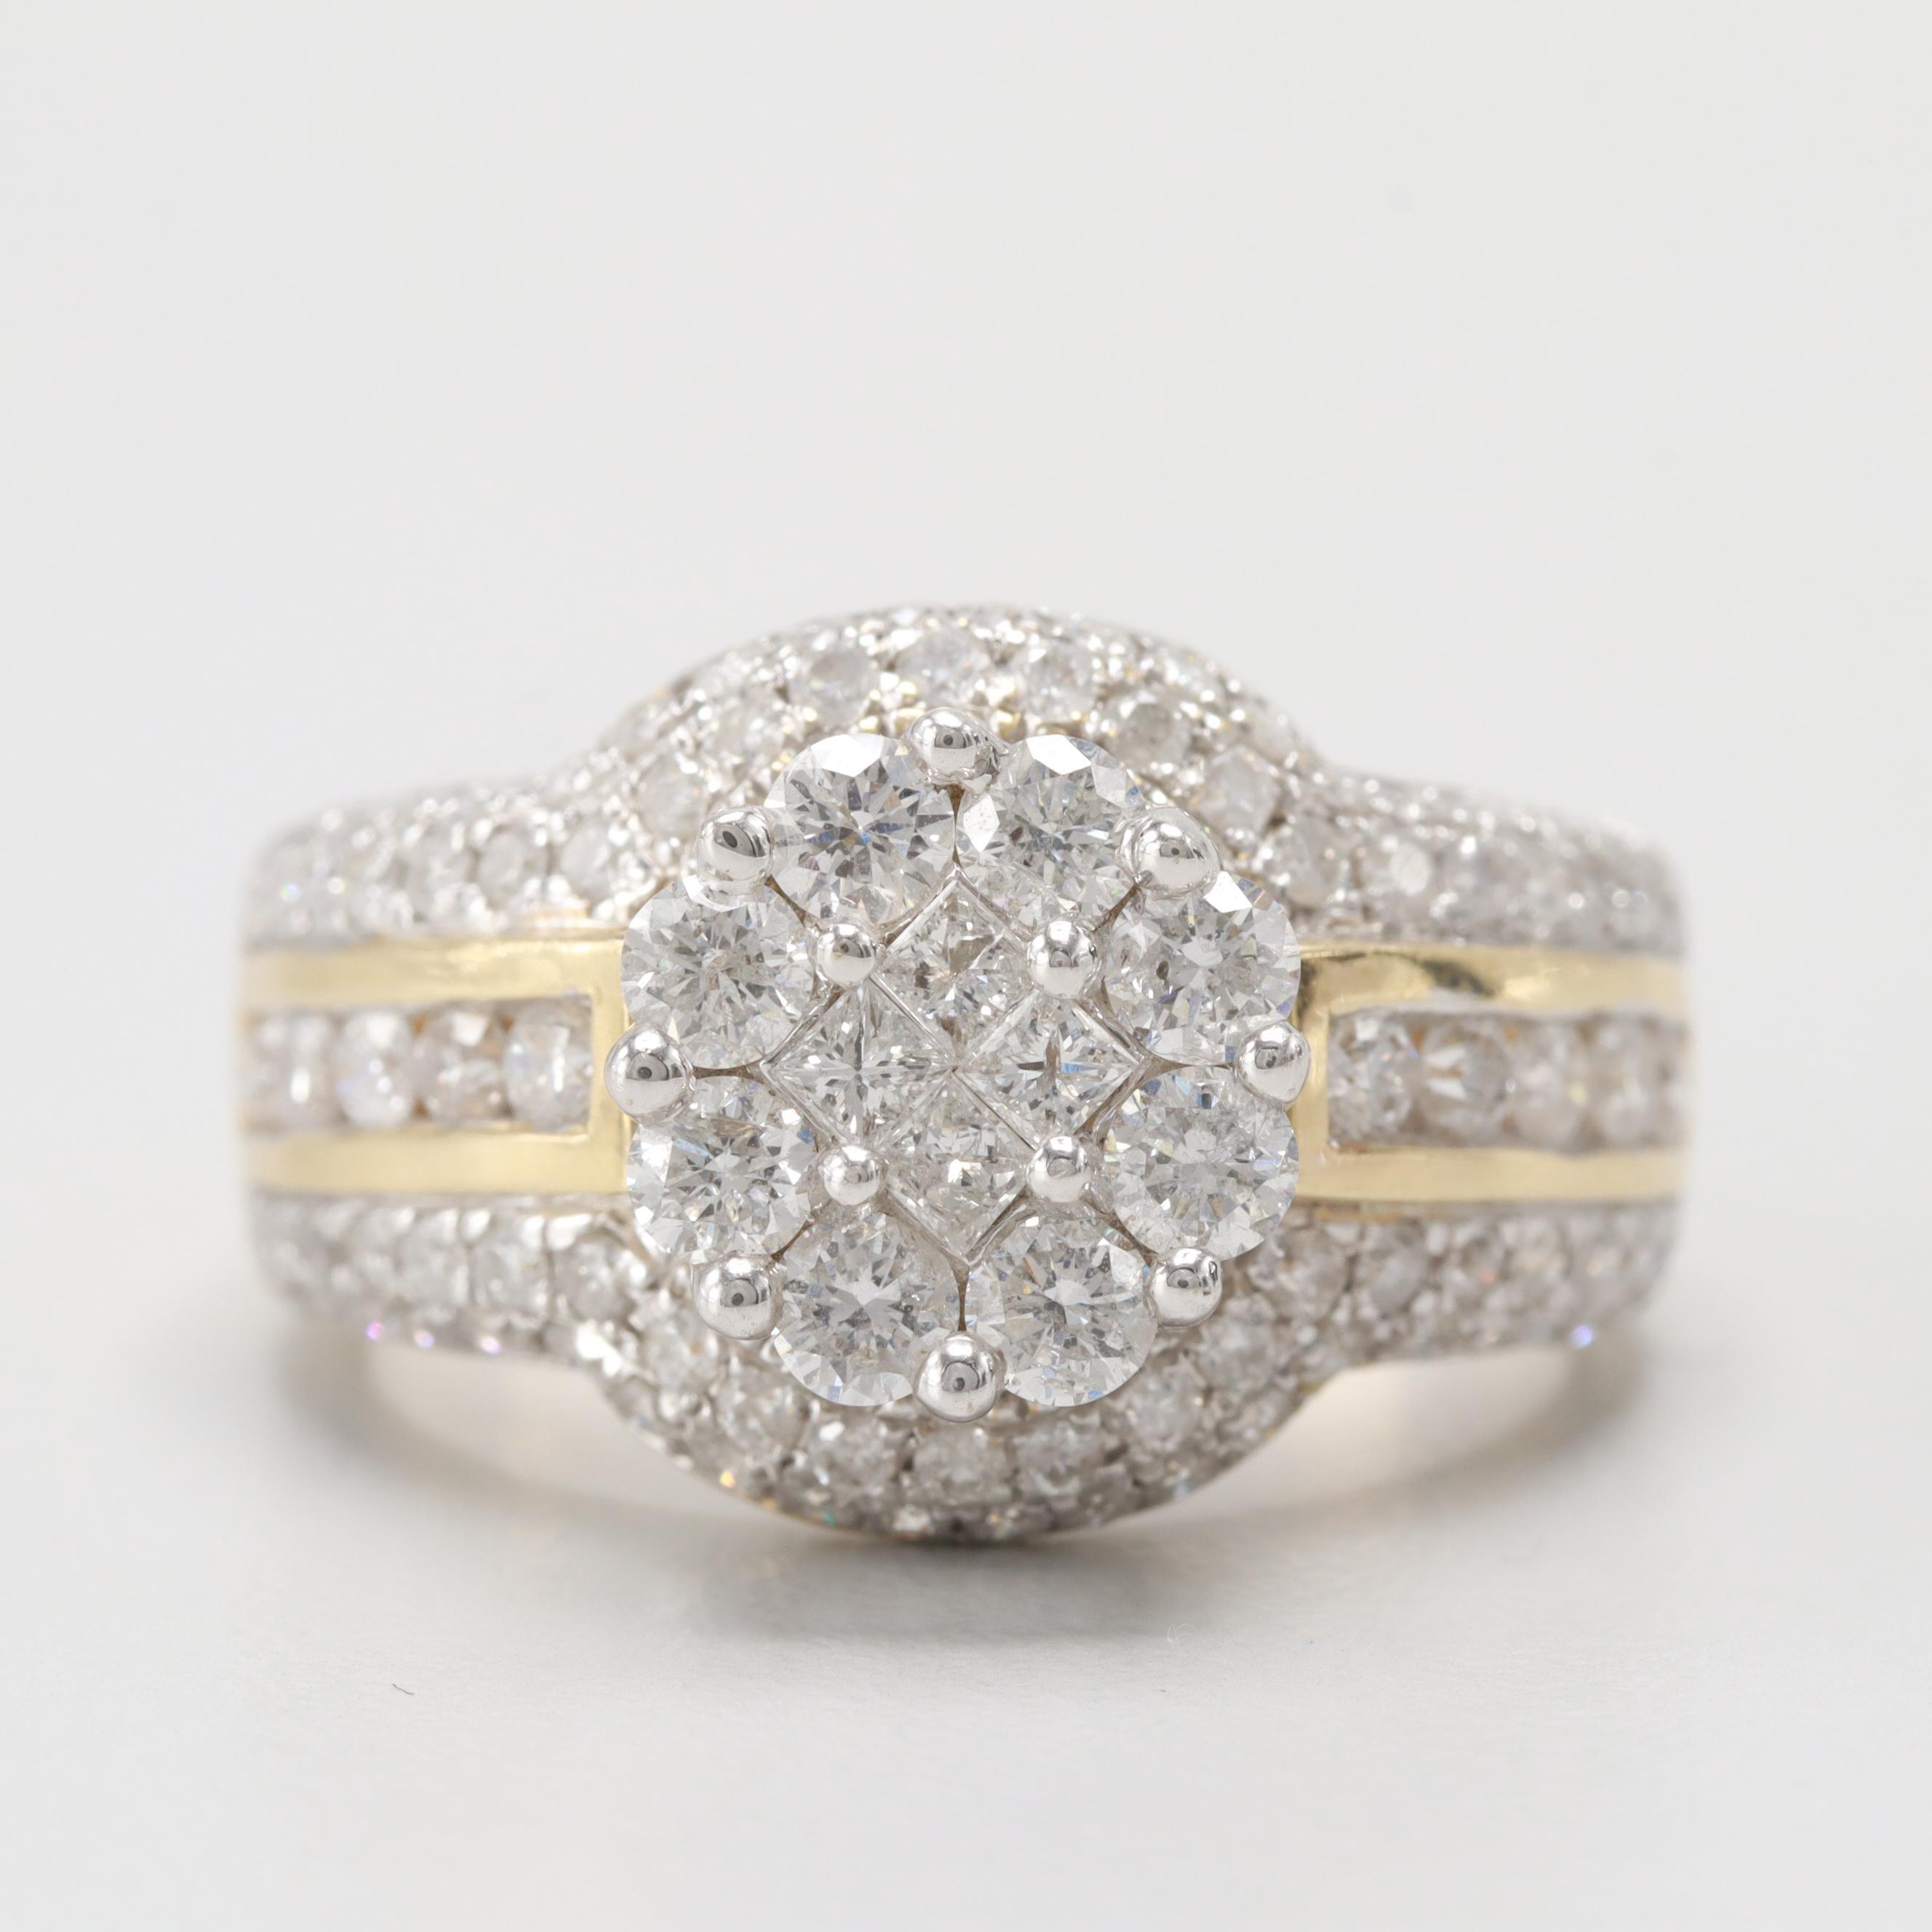 14K Yellow and White Gold 1.58 CTW Diamond Ring